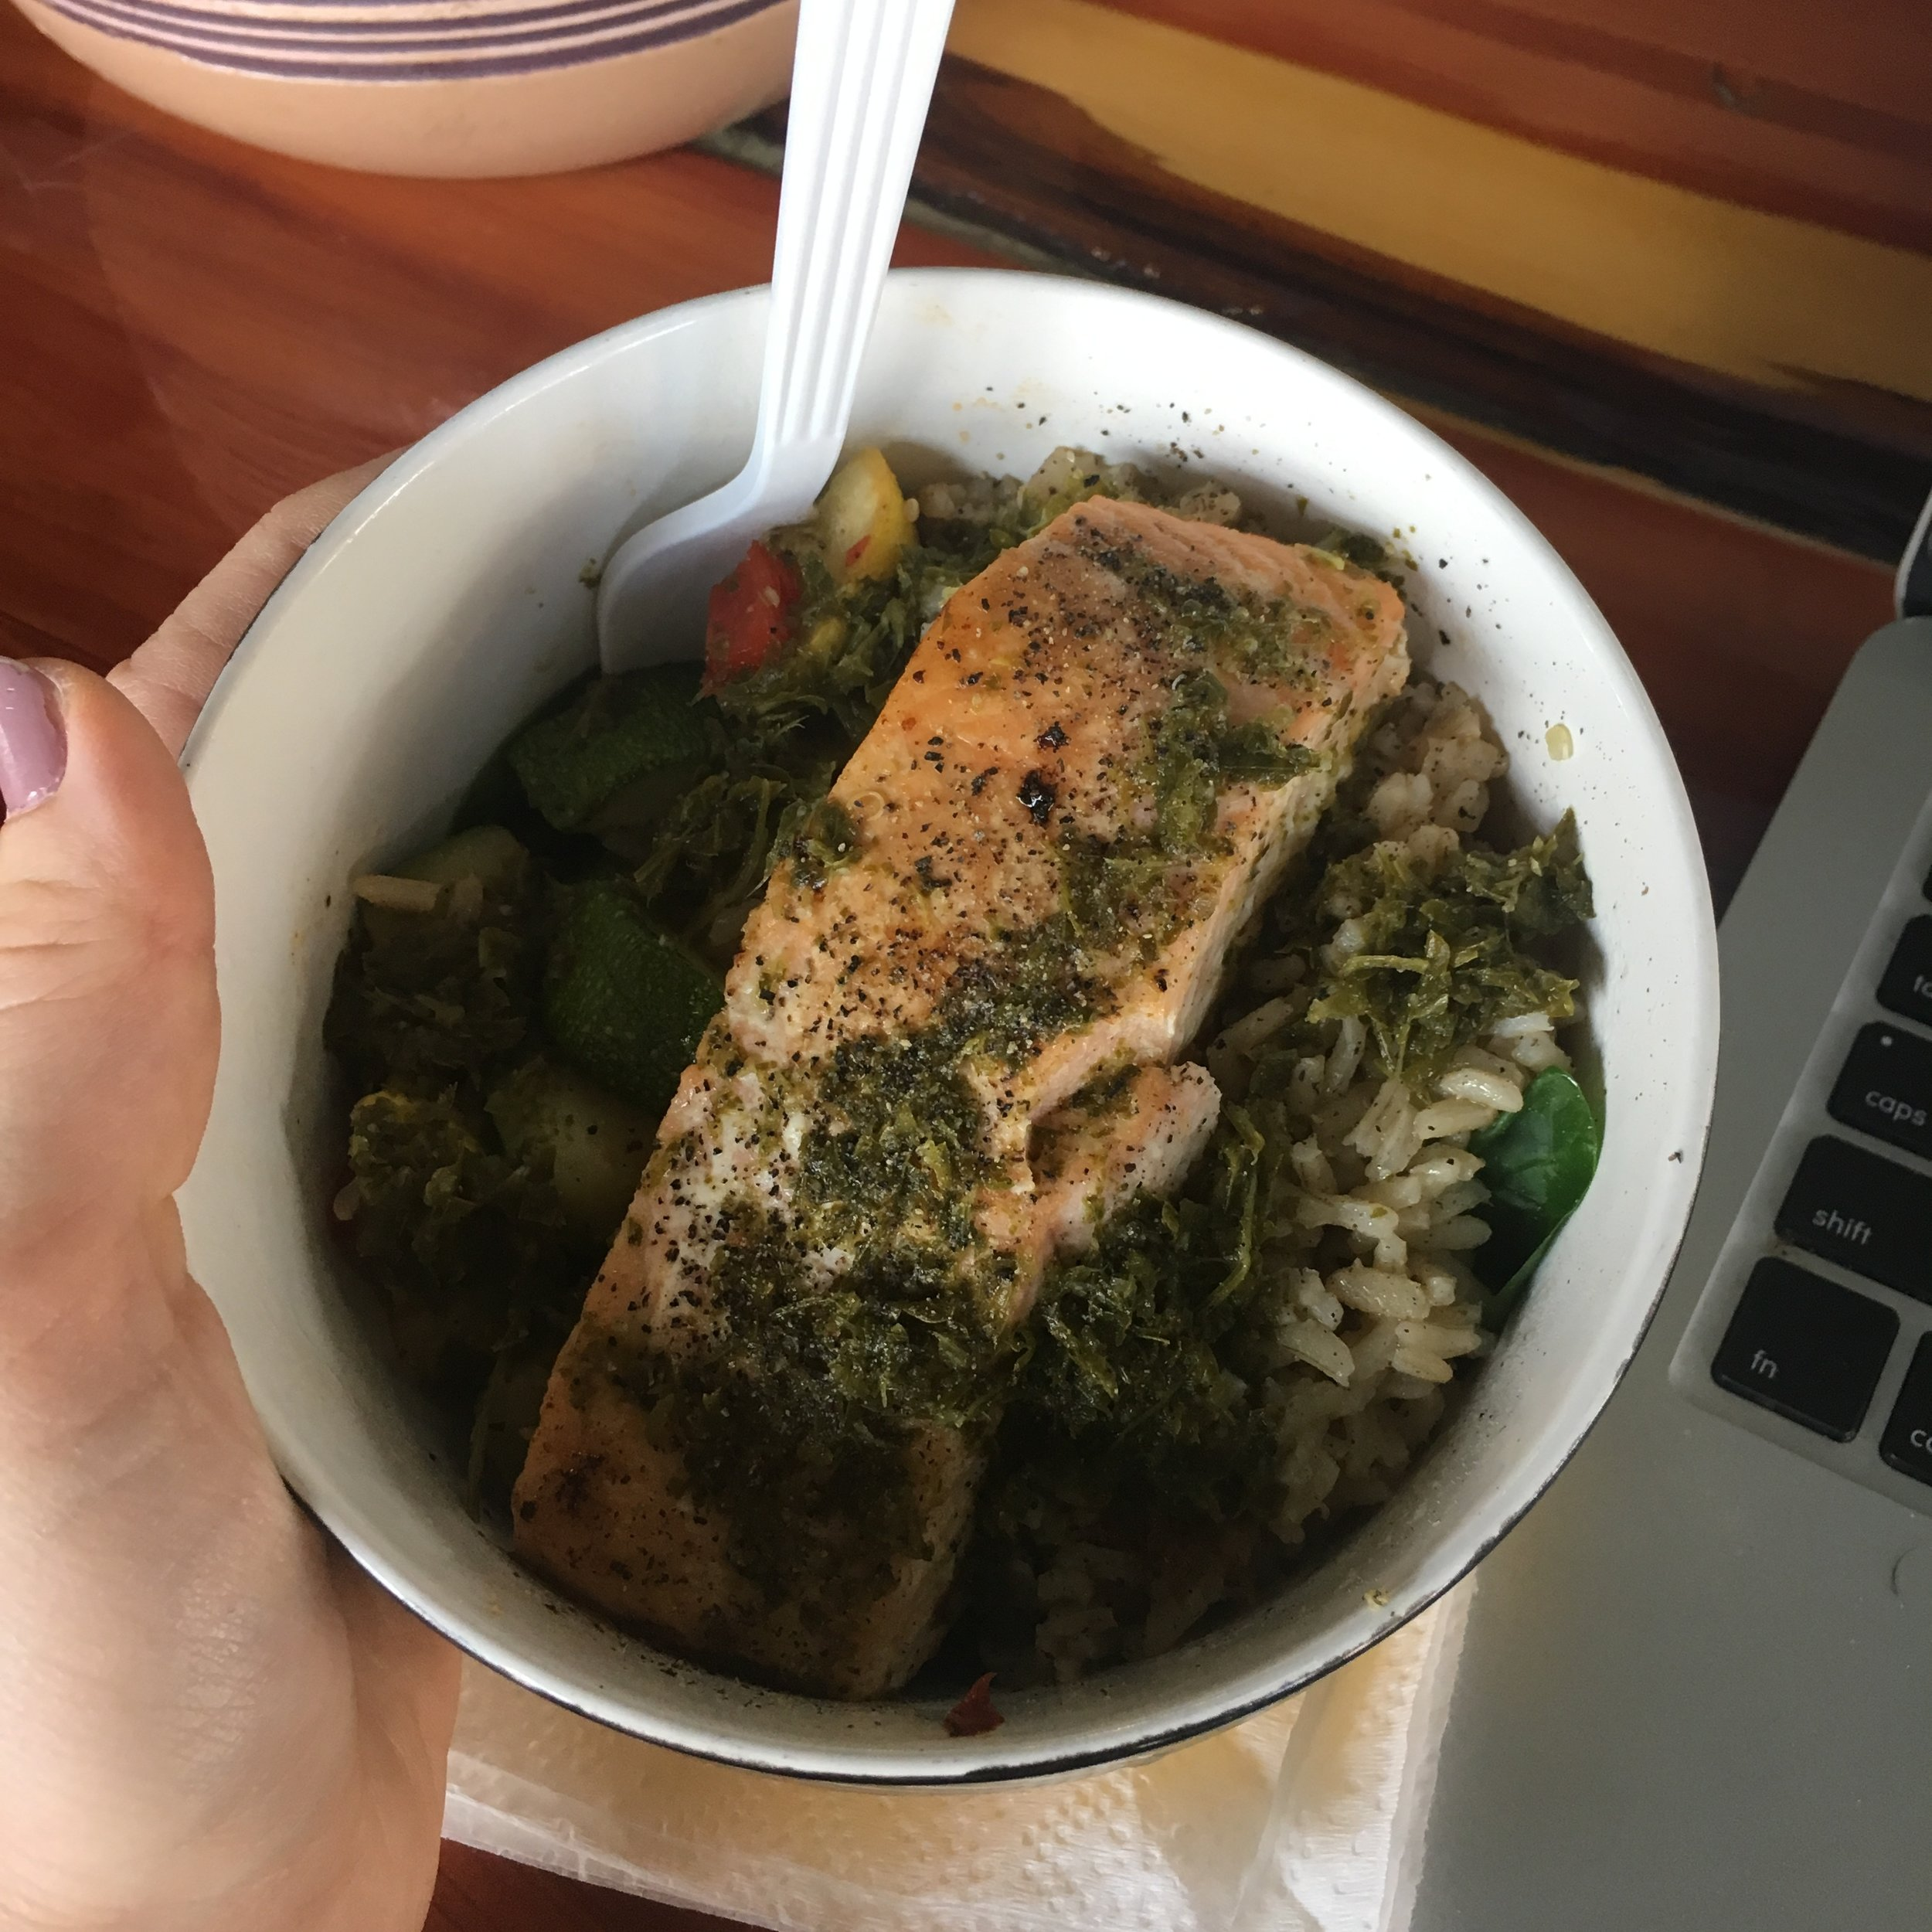 Salmon with sautéed veggies and brown rice!